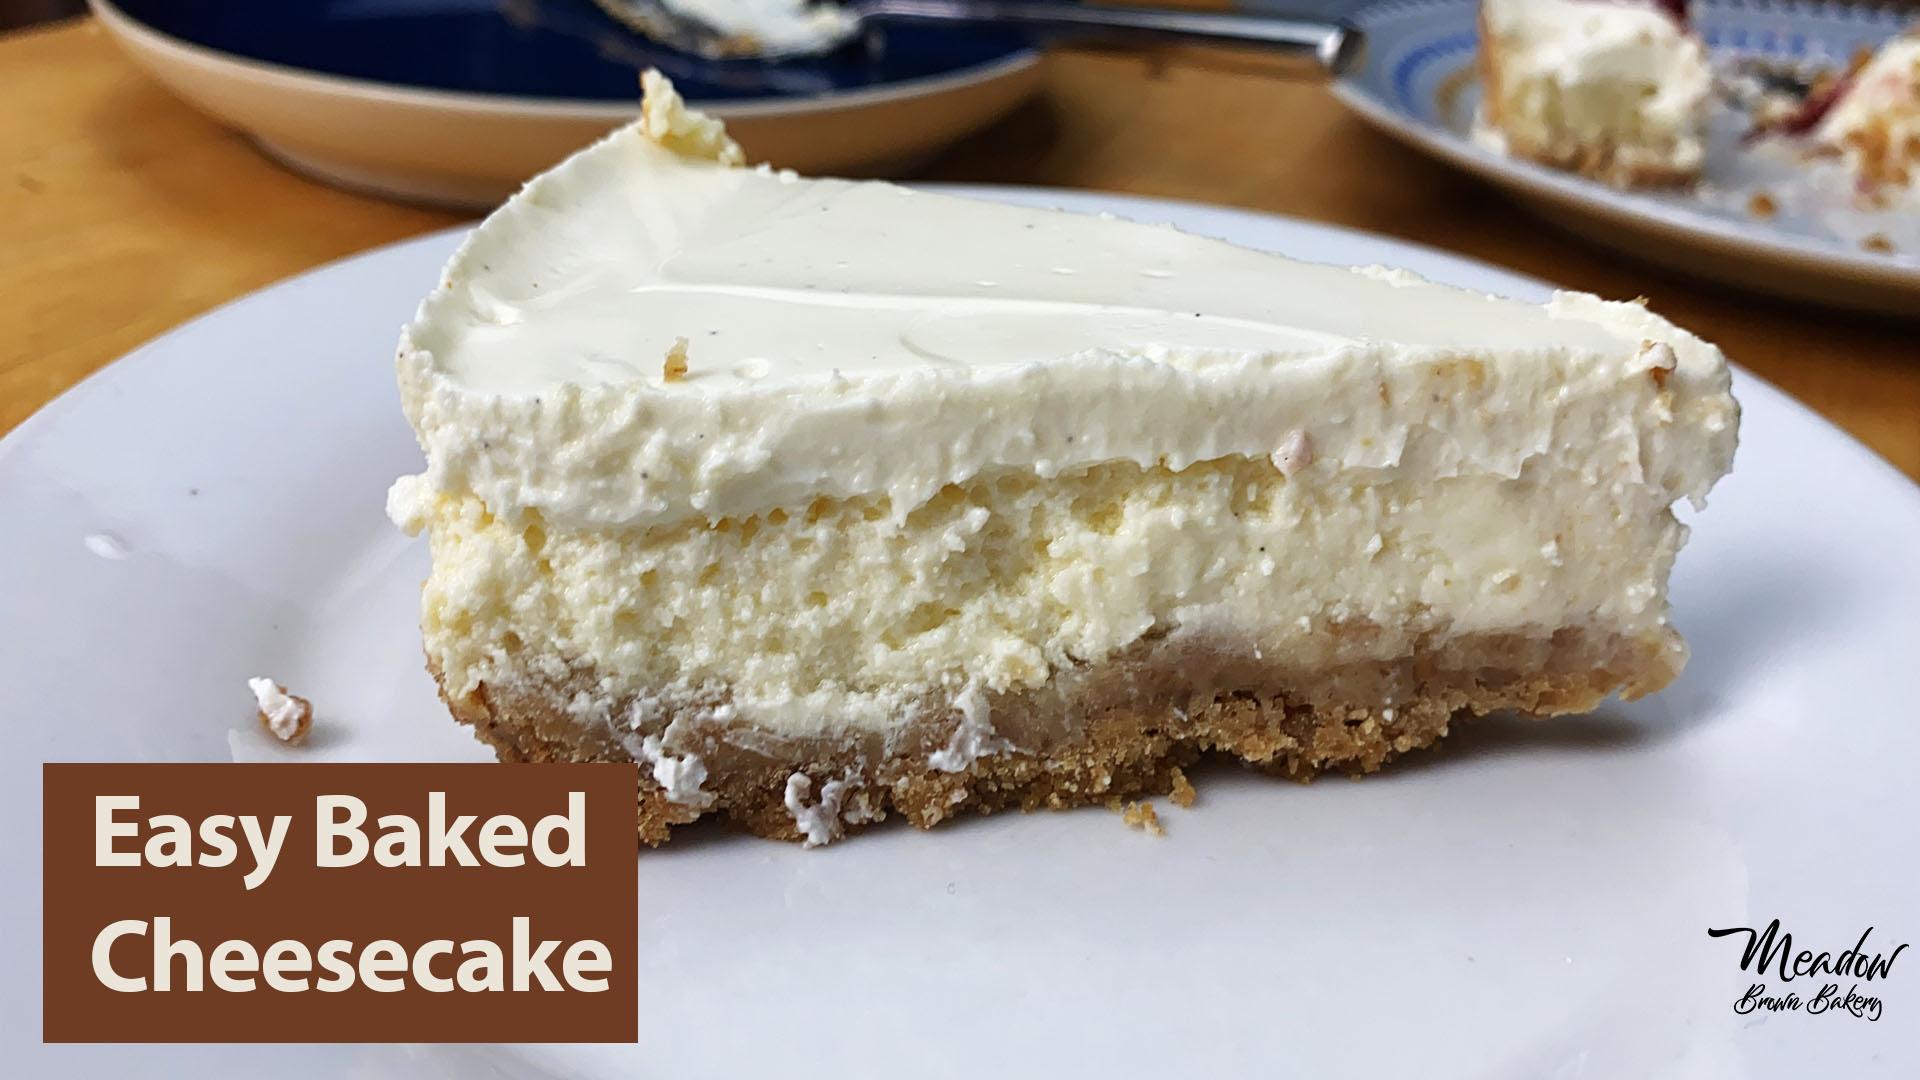 Baked cheesecake recipe UK